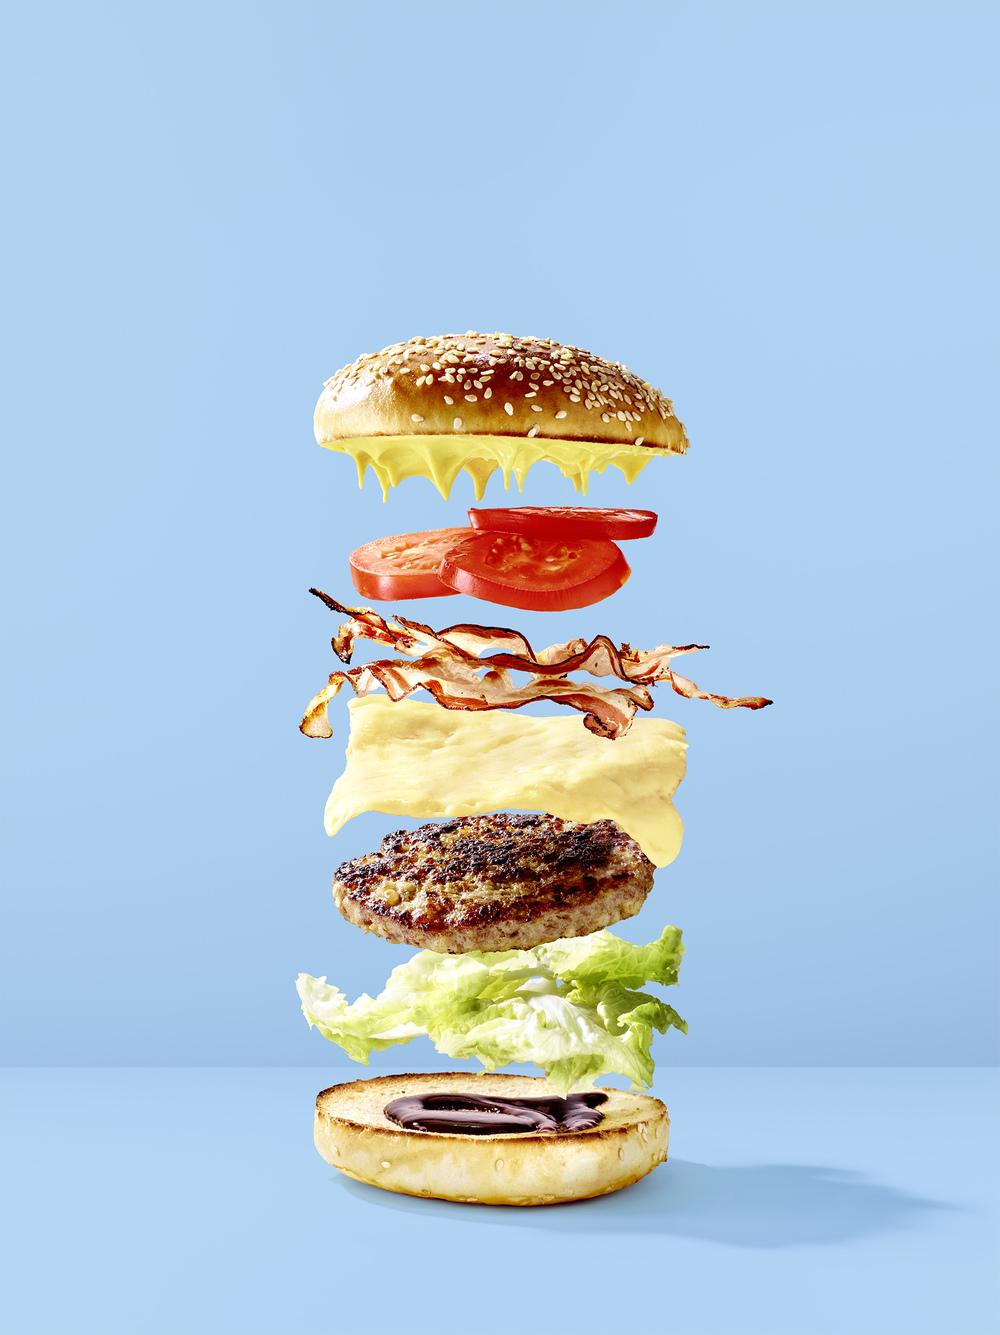 Hauptsache_Burger_02_Montage.jpg